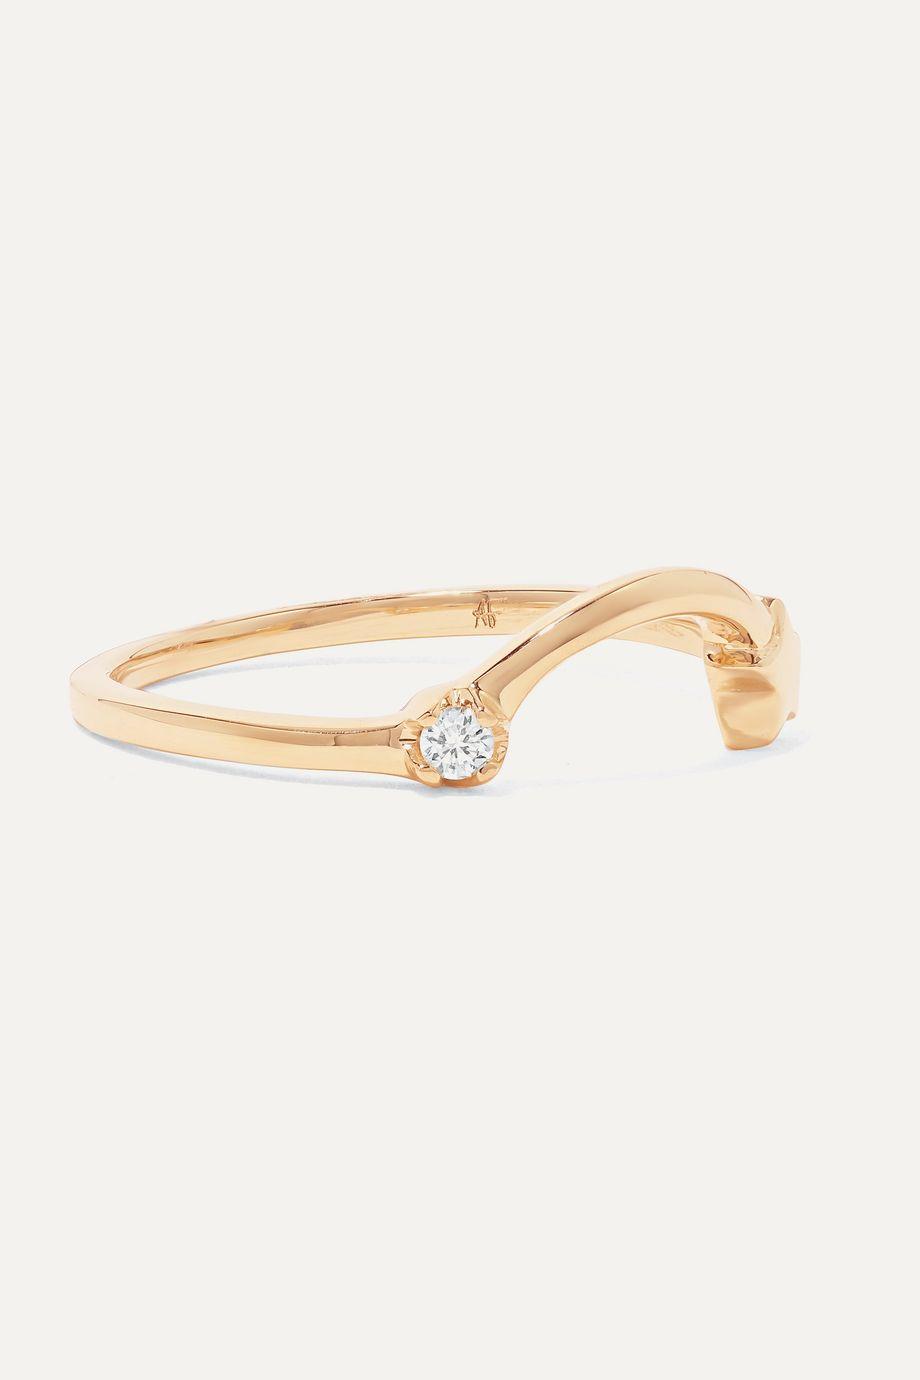 Andrea Fohrman Shooting Star Ring aus 14 Karat Gold mit Diamant